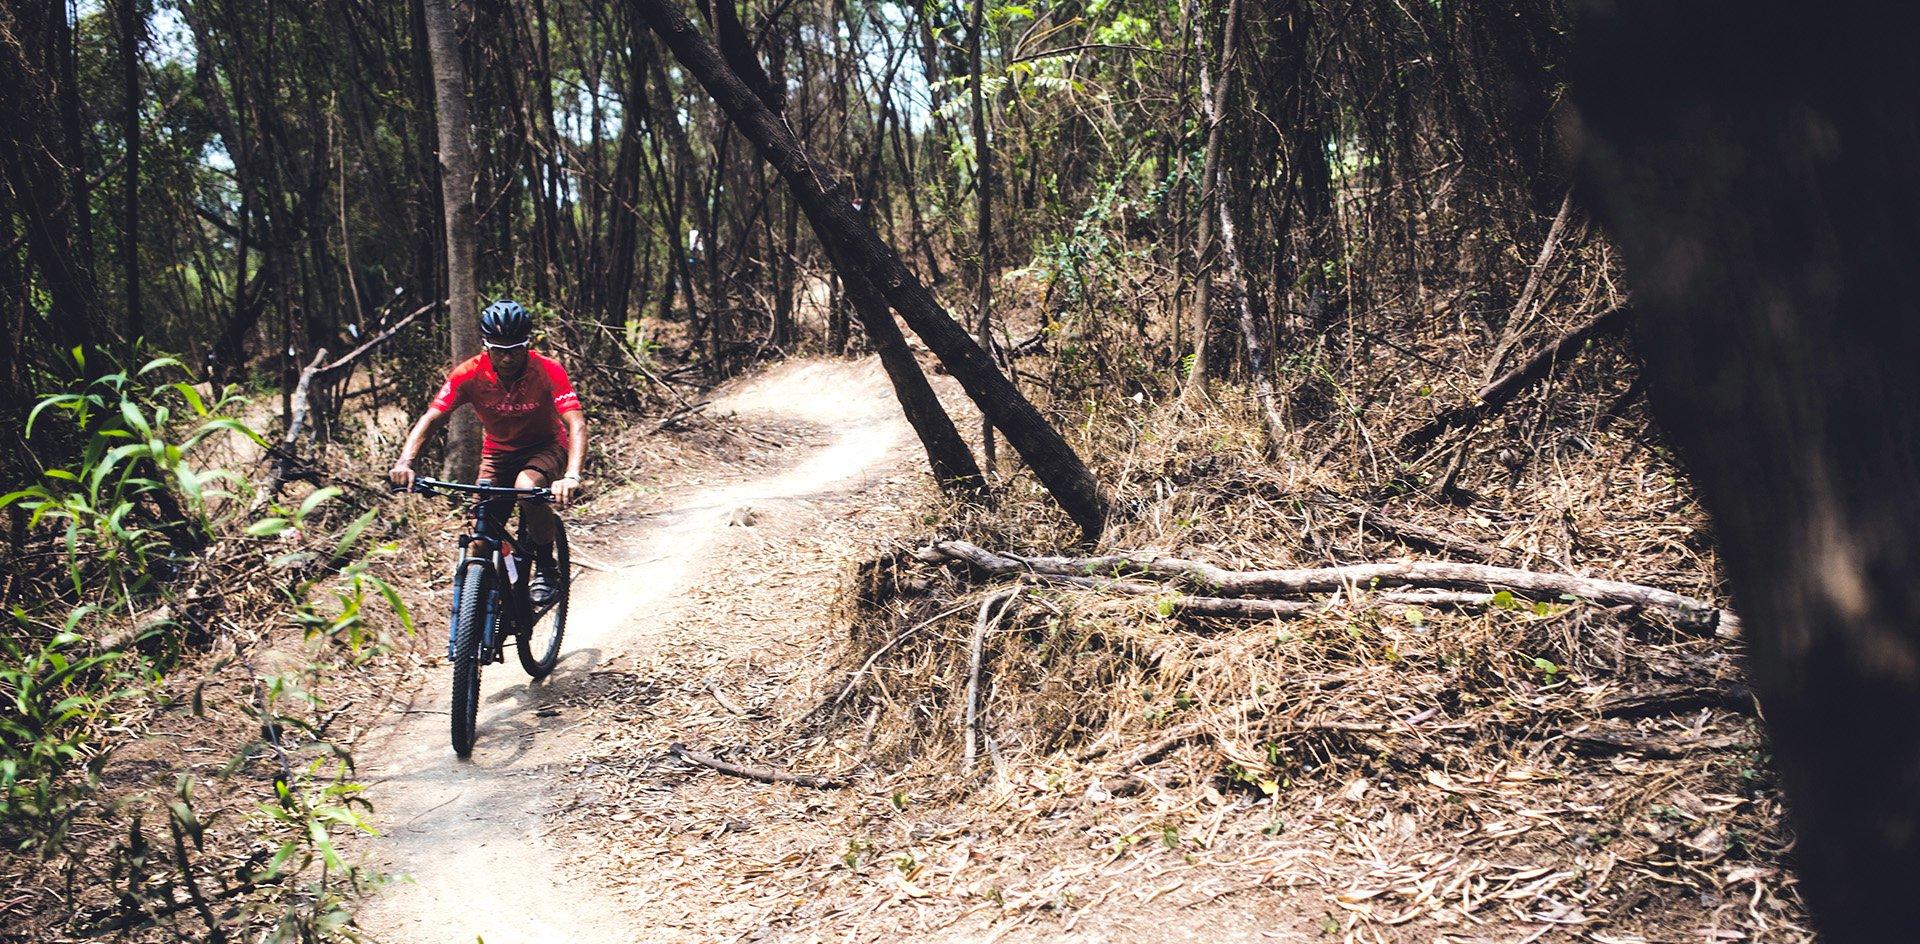 f887794bcef Northern Thailand Mountain Bike Trip: 9 Days Riding on Trails, Jeep ...